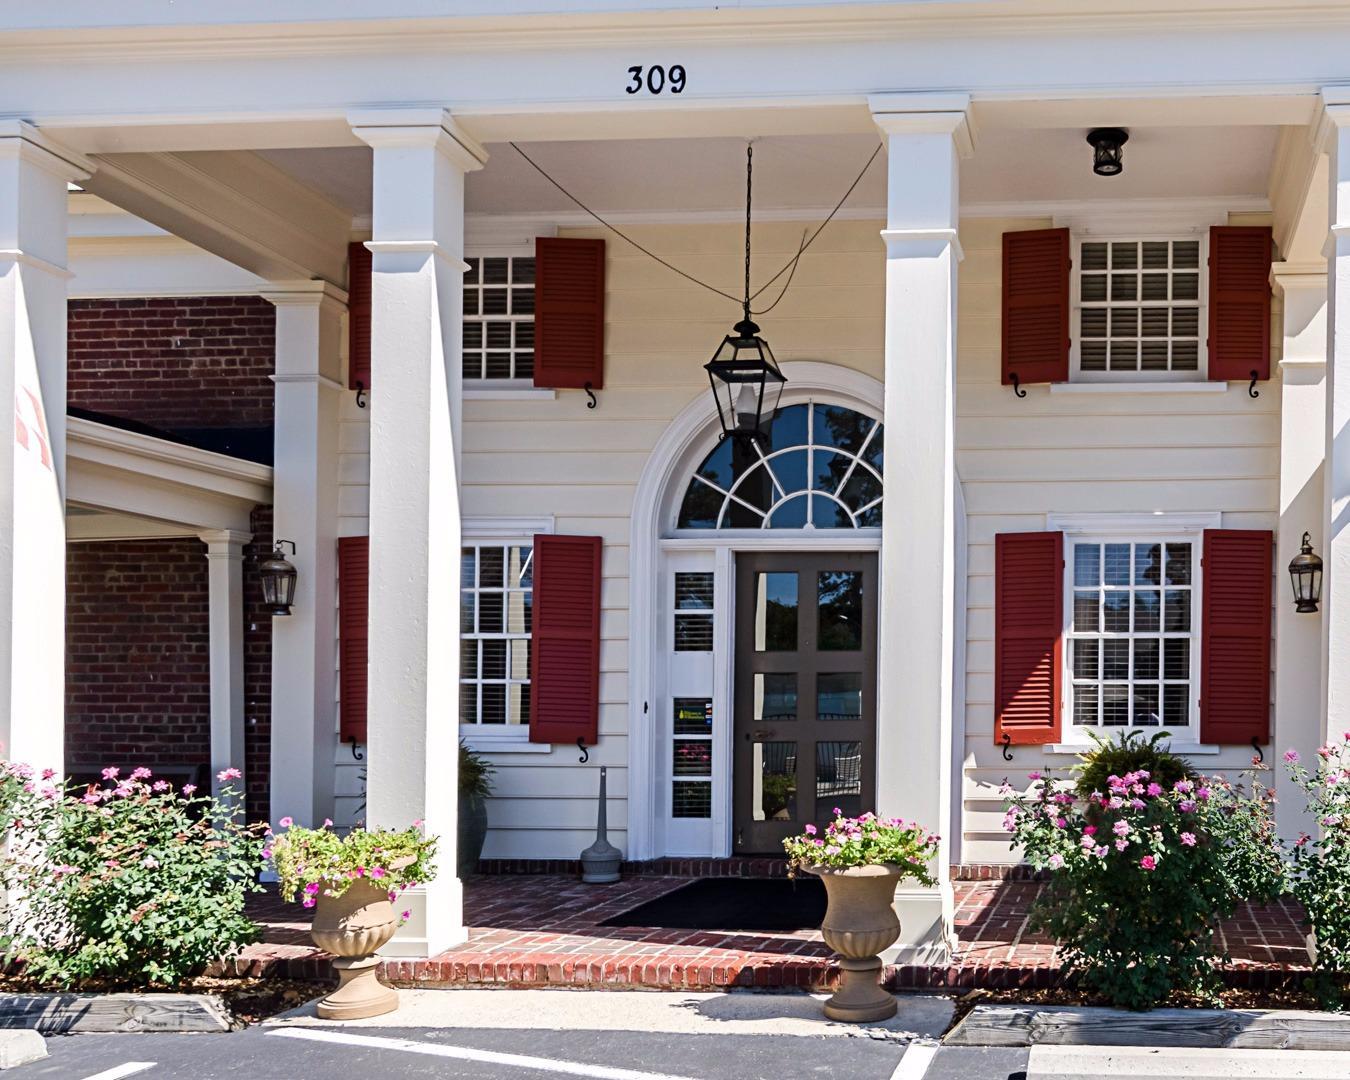 Rodeway Inn Historic in Williamsburg, VA 23185 ... Williamsburg Virginia Chamber Of Commerce Photos